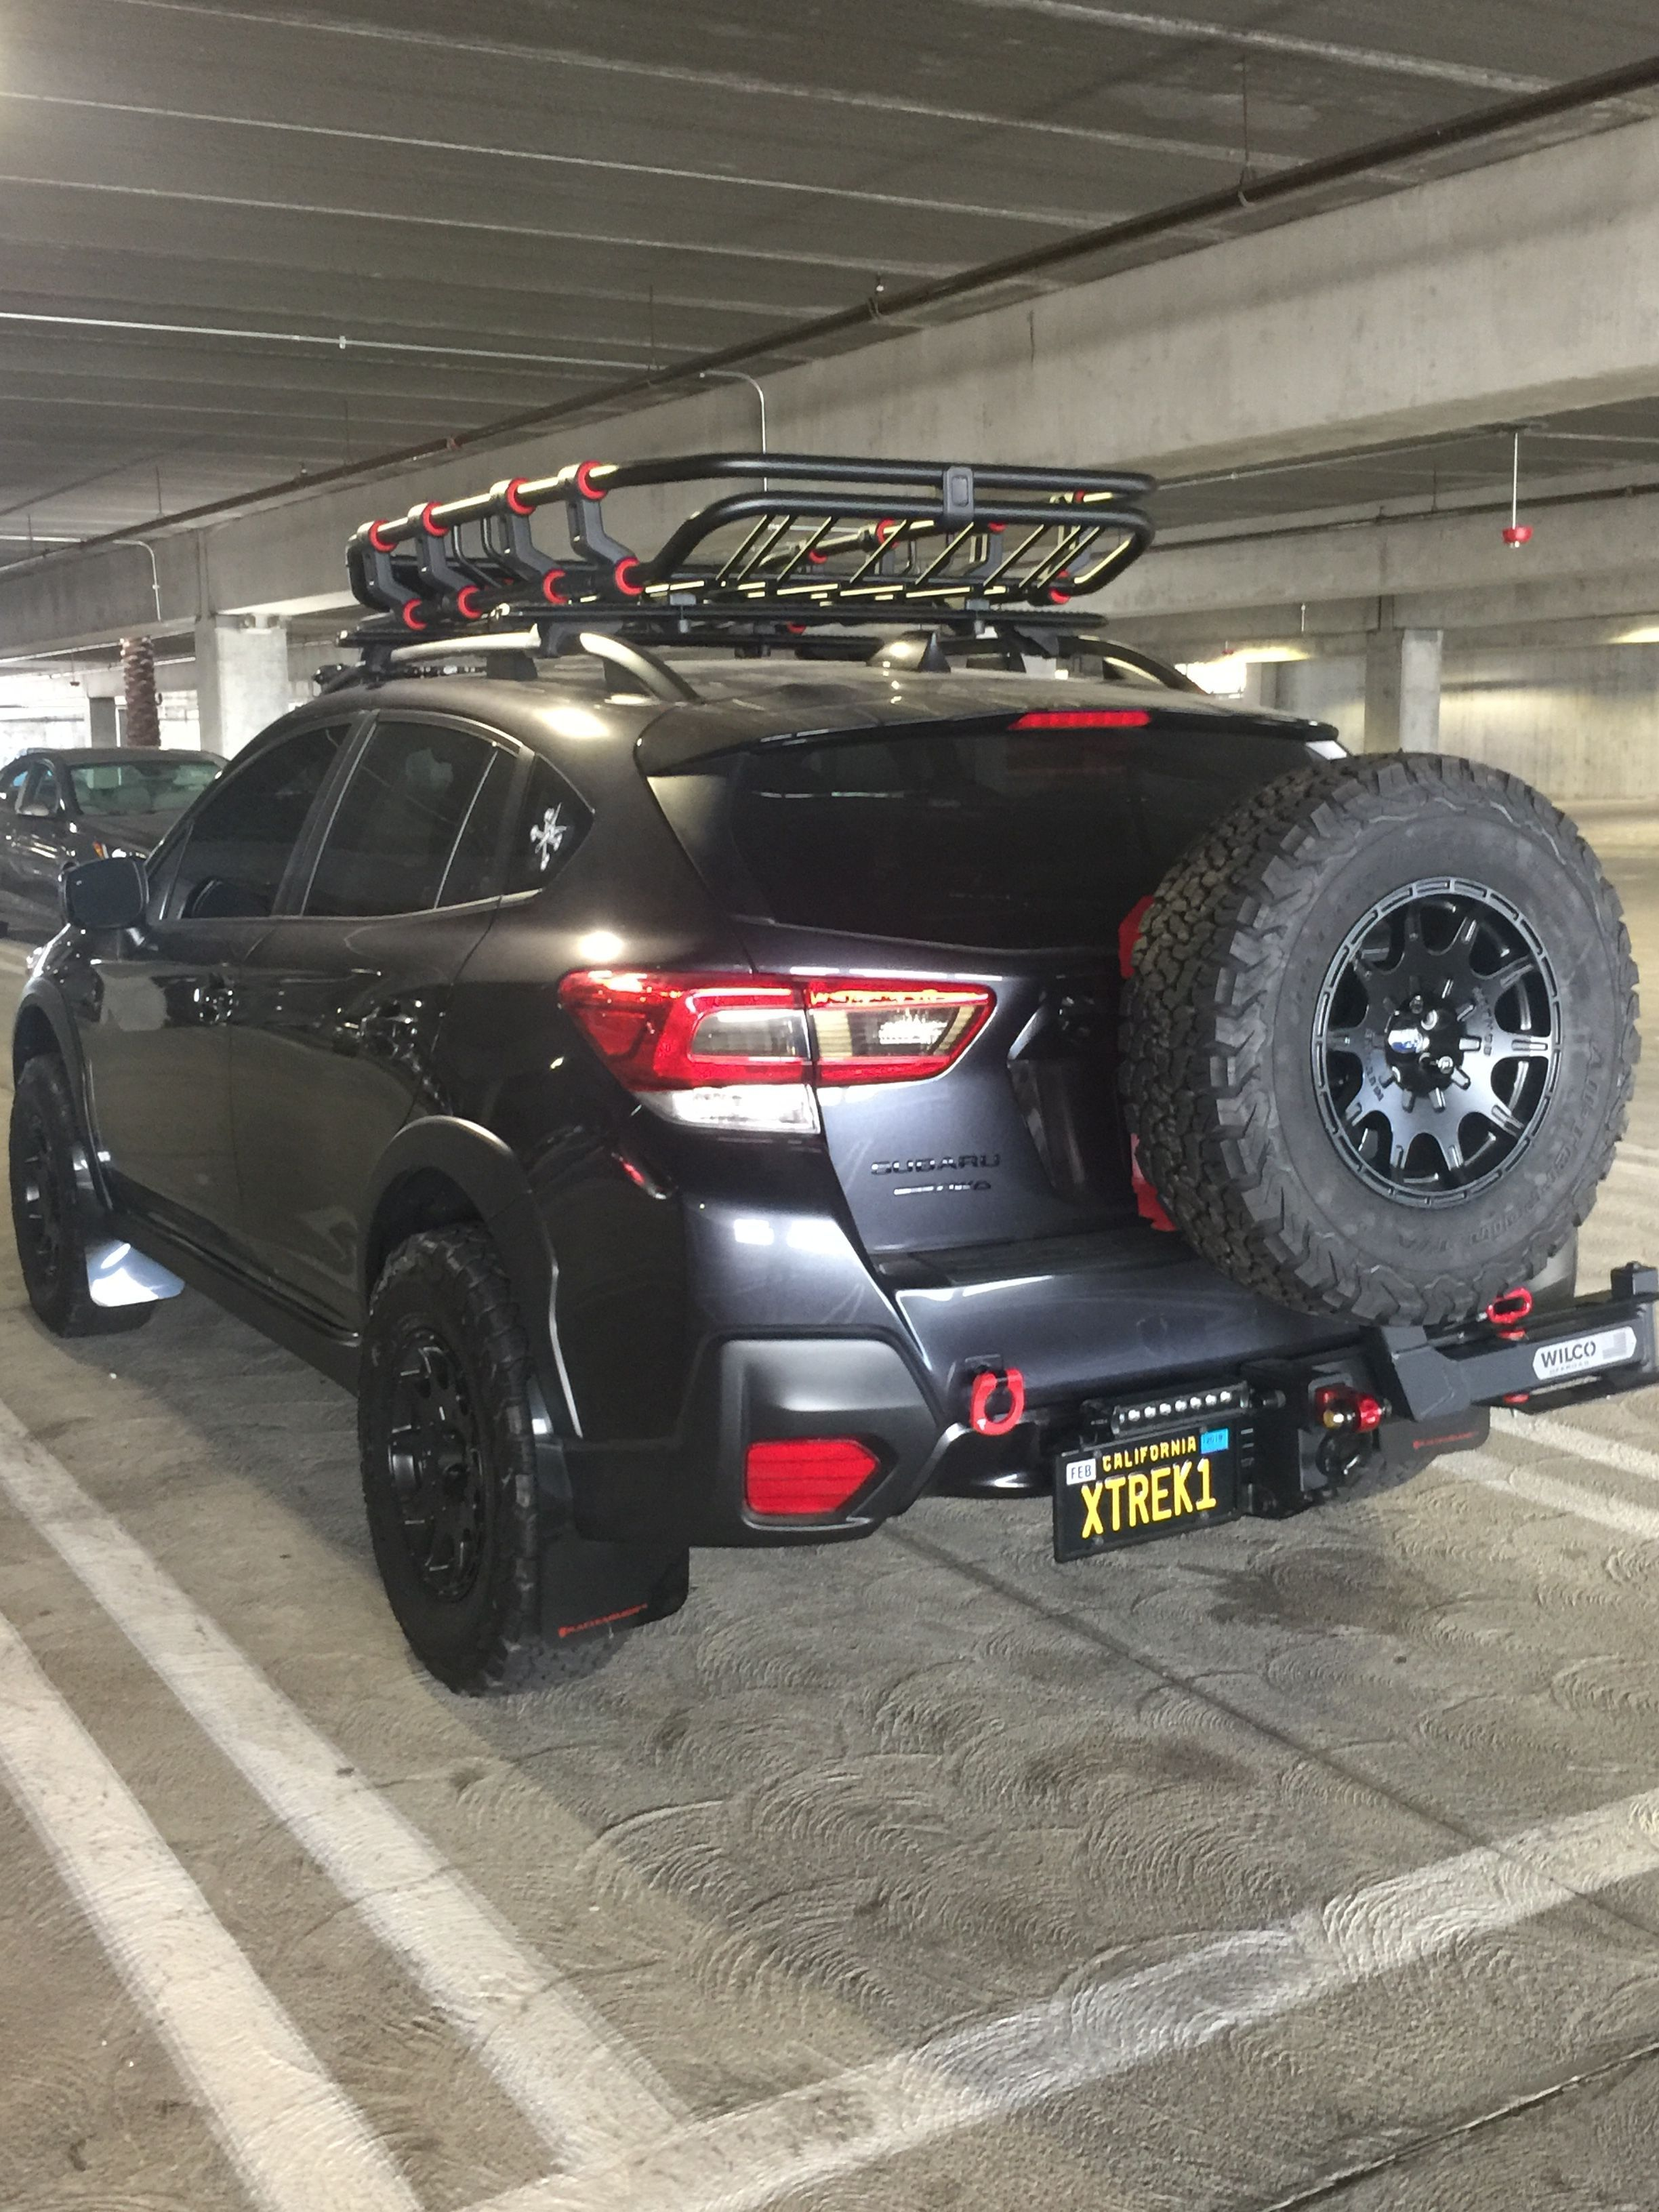 10 Fearsome Wheels Rims Concept Ideas Subaru Crosstrek Subaru Cars Car Wheels